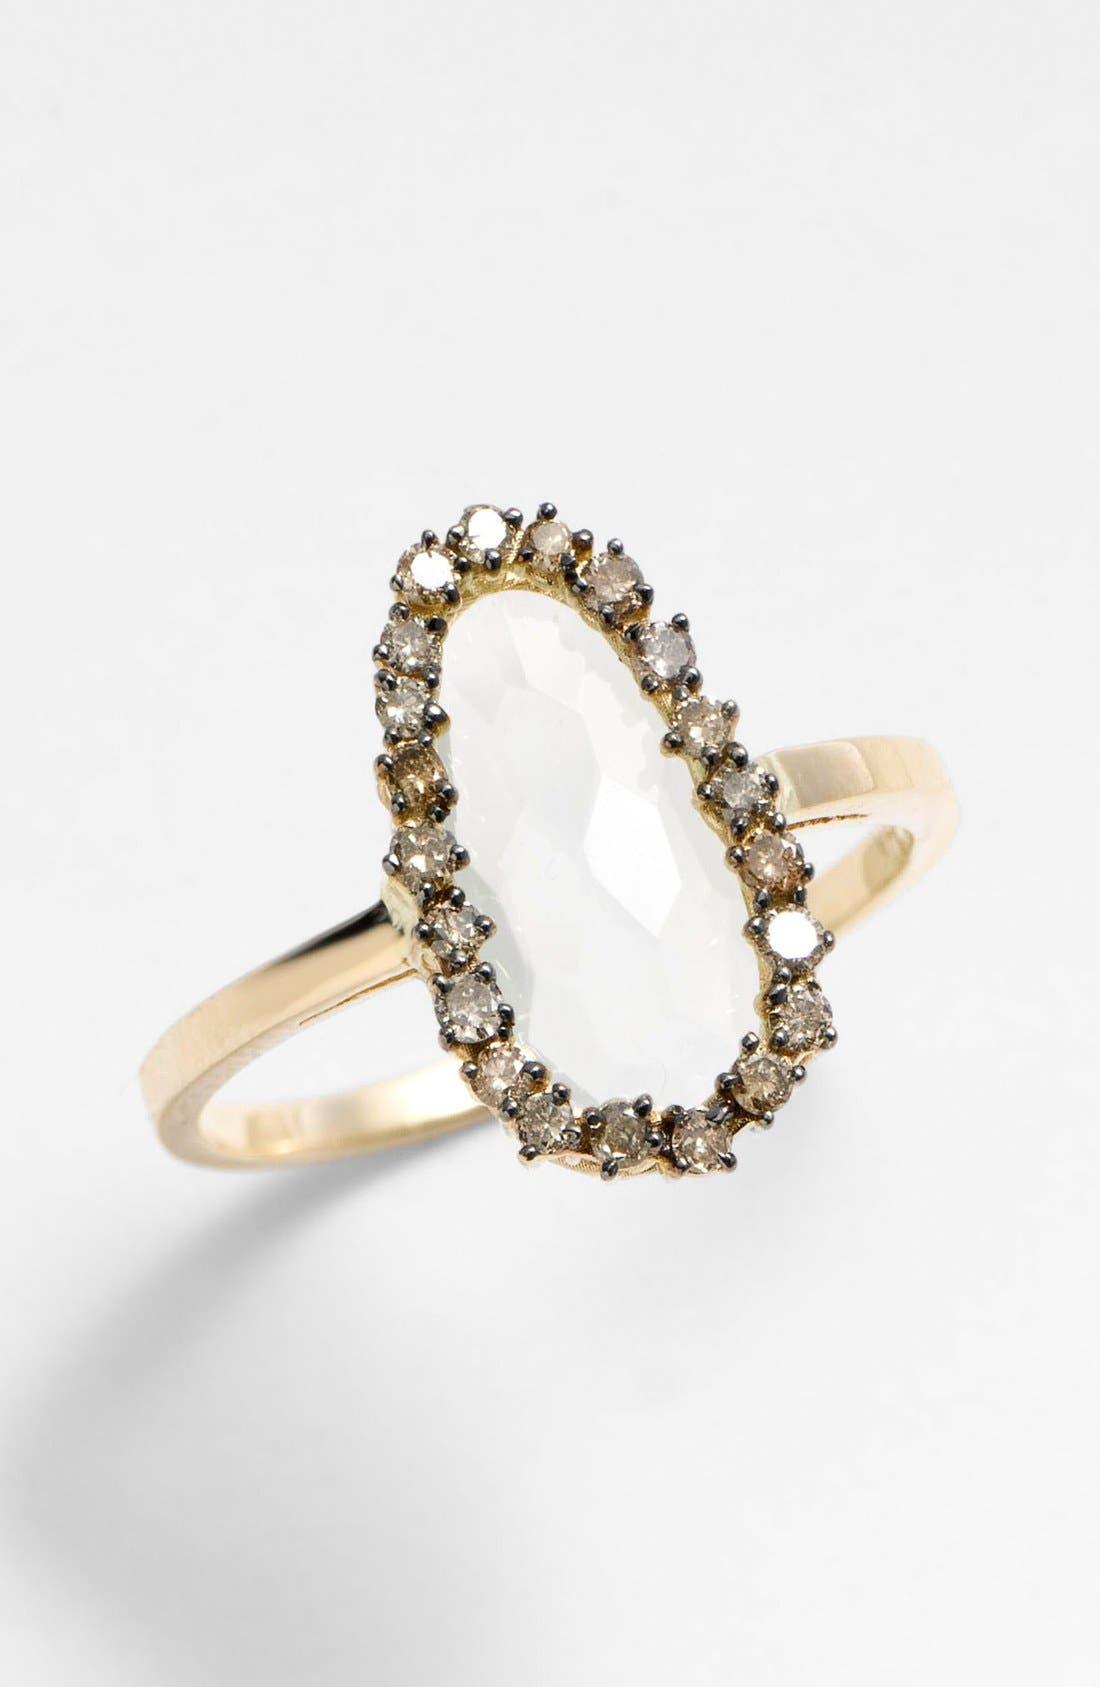 Alternate Image 1 Selected - KALAN by Suzanne Kalan Pear Stone Ring